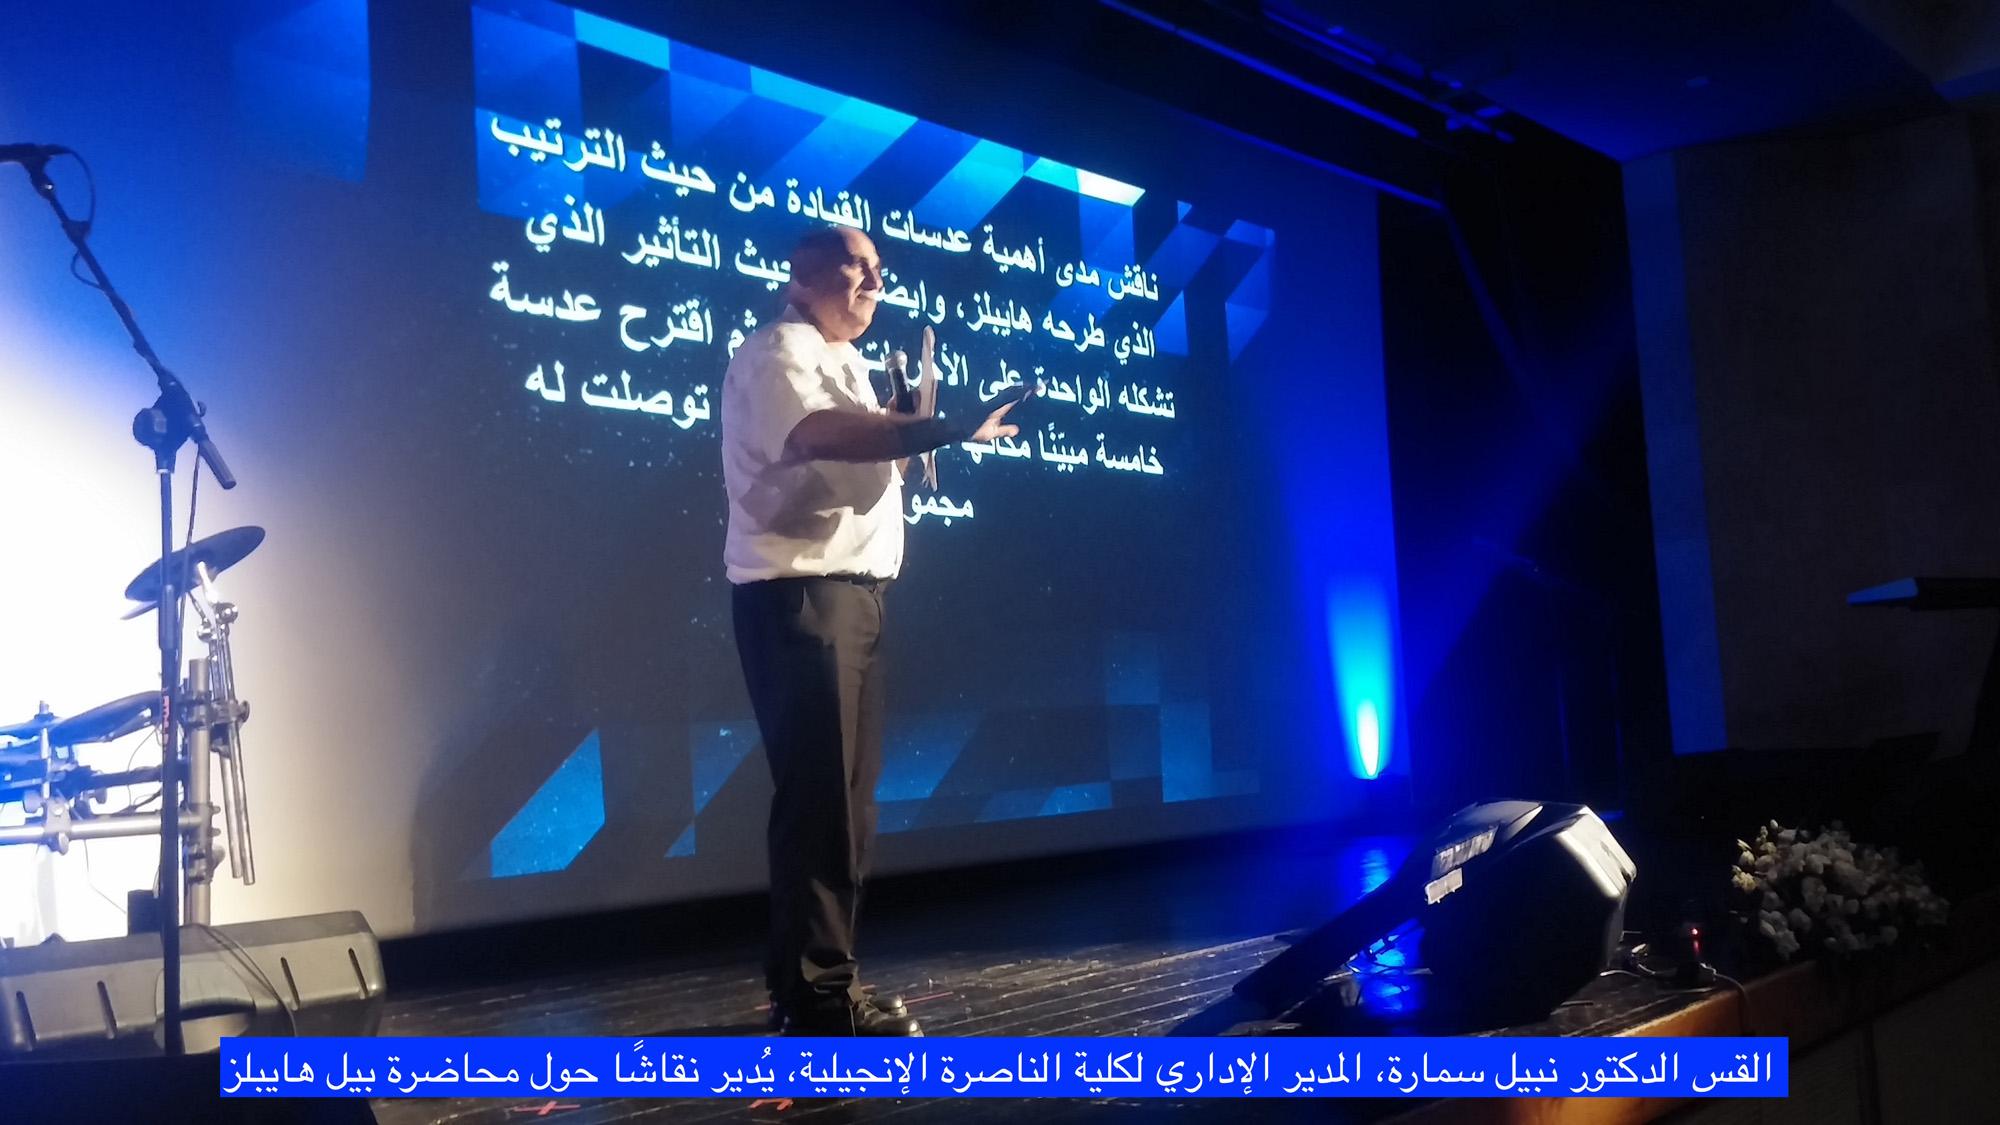 Rev. Nabil Samara on Bill Hybels' Lecture